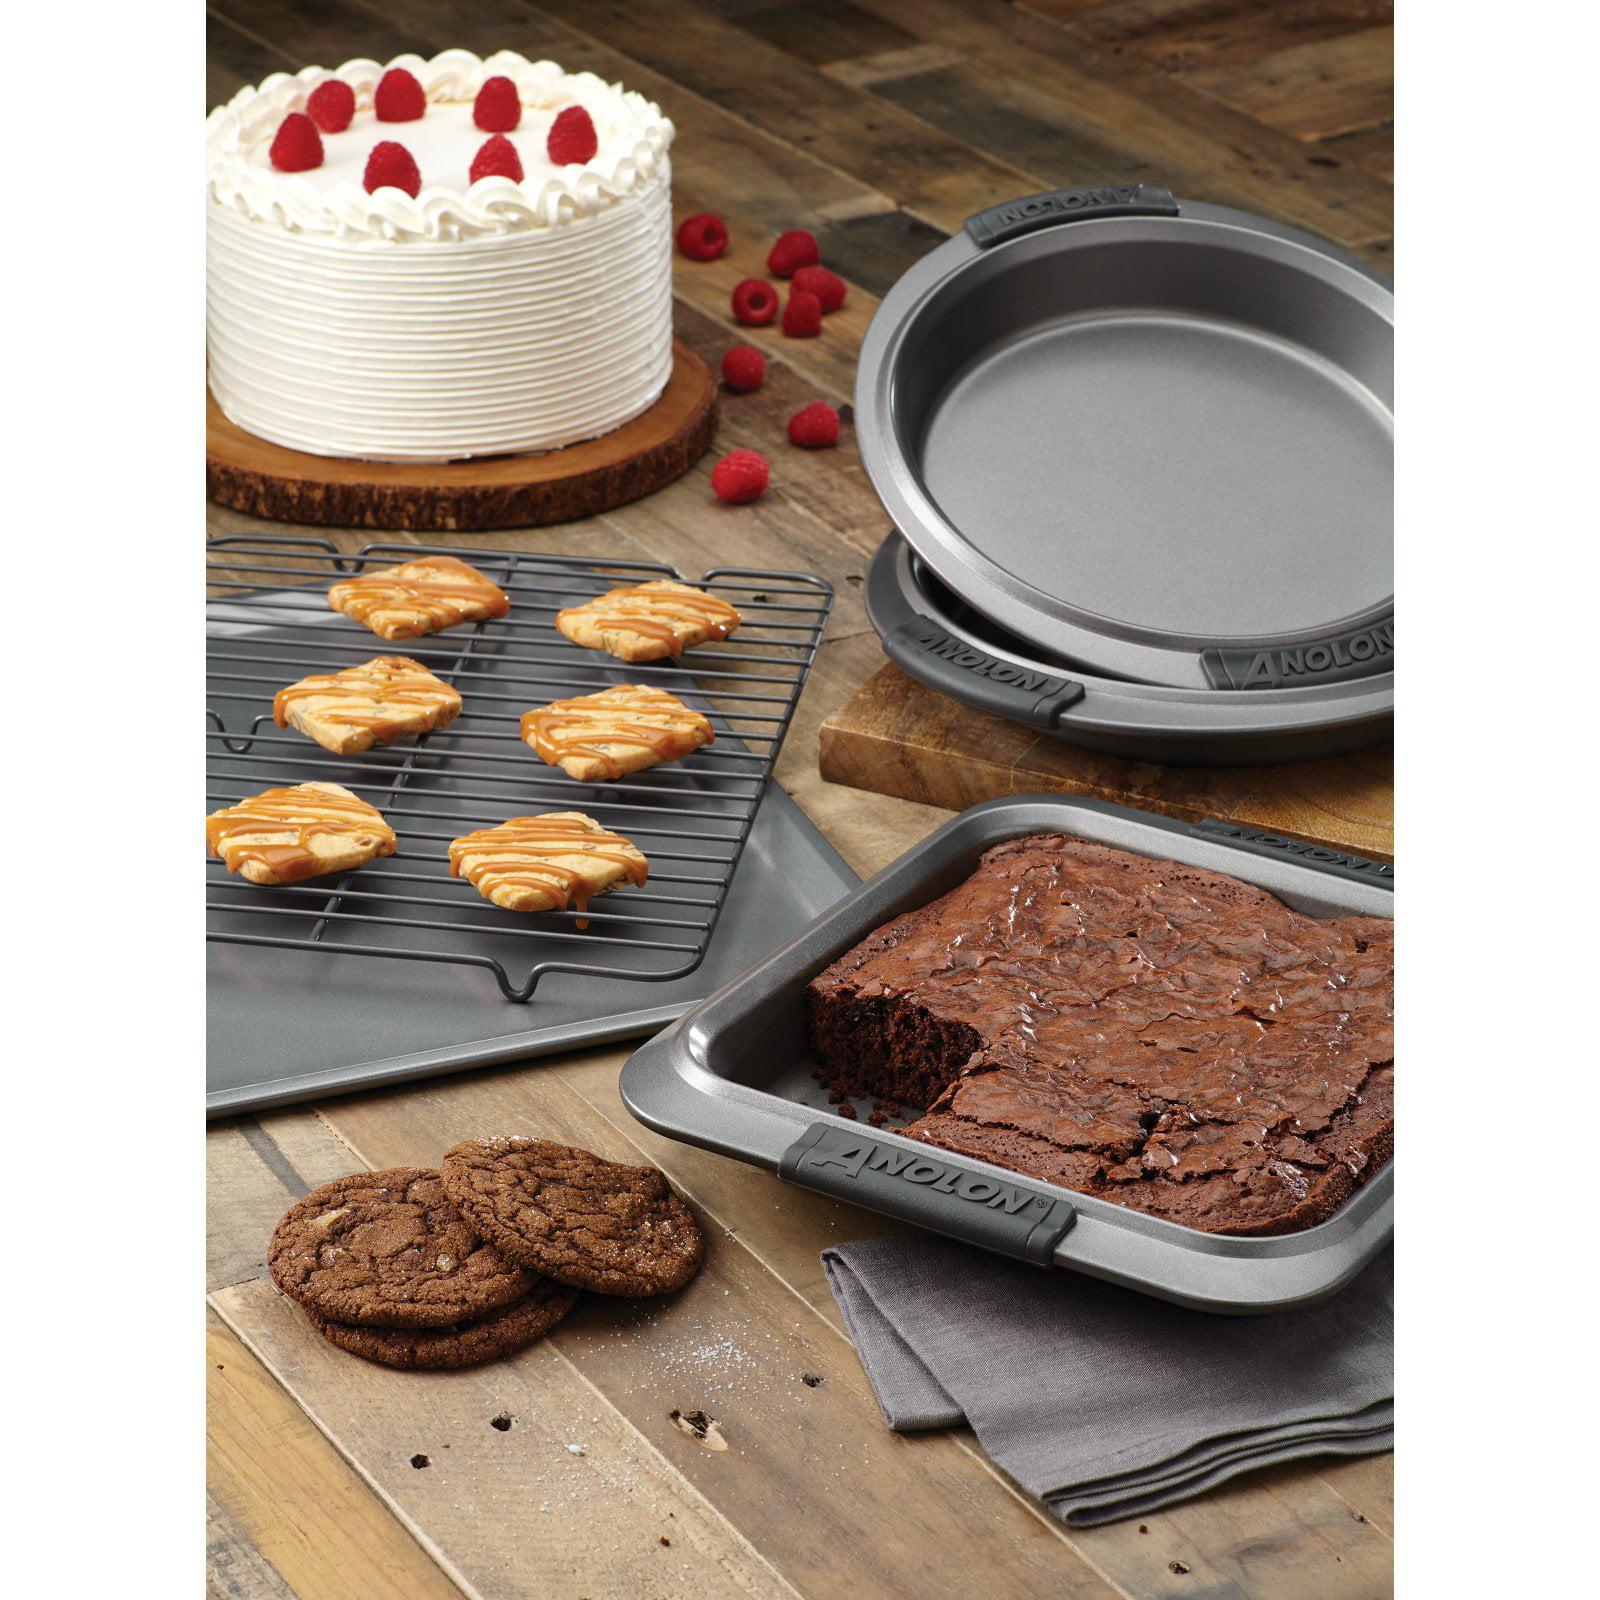 Anolon Advanced Nonstick Hard-Anodized 5 Piece Bakeware Set by Anolon